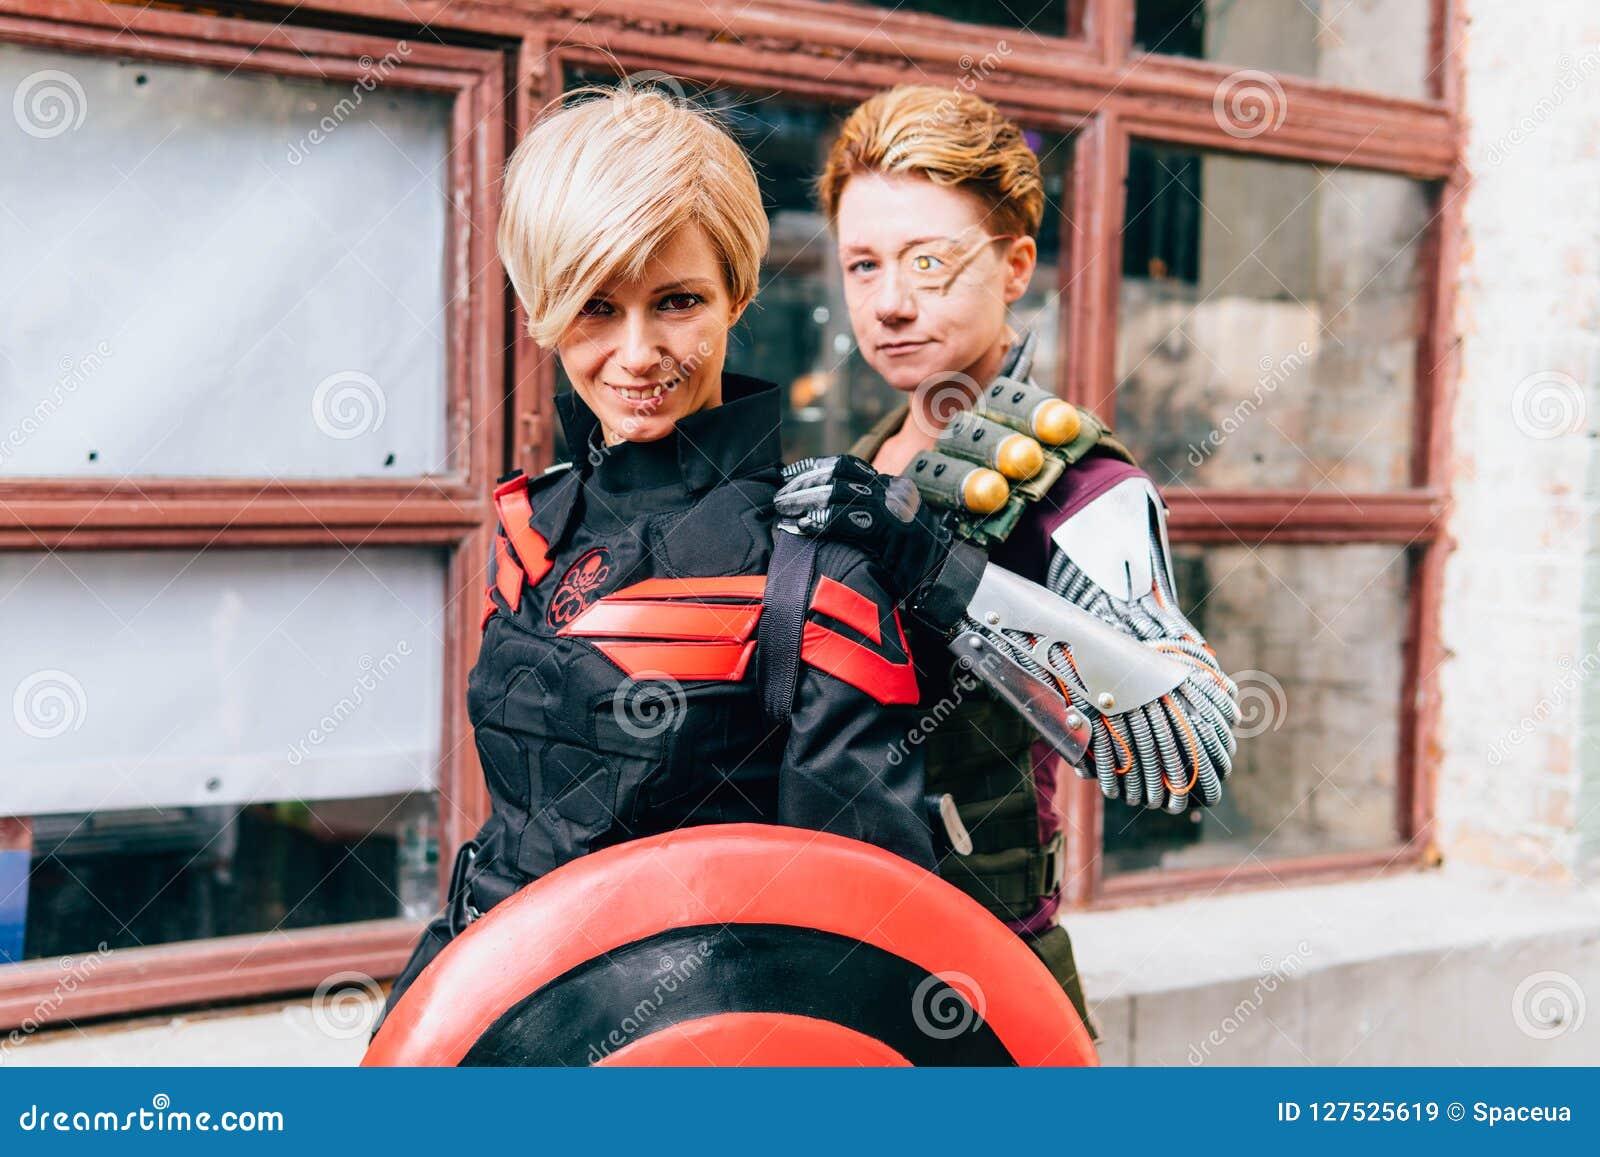 KYIV, ΟΥΚΡΑΝΊΑ - 9 ΣΕΠΤΕΜΒΡΊΟΥ 2018: Τοποθέτηση Cosplayers στο κωμικό κοβάλτιο